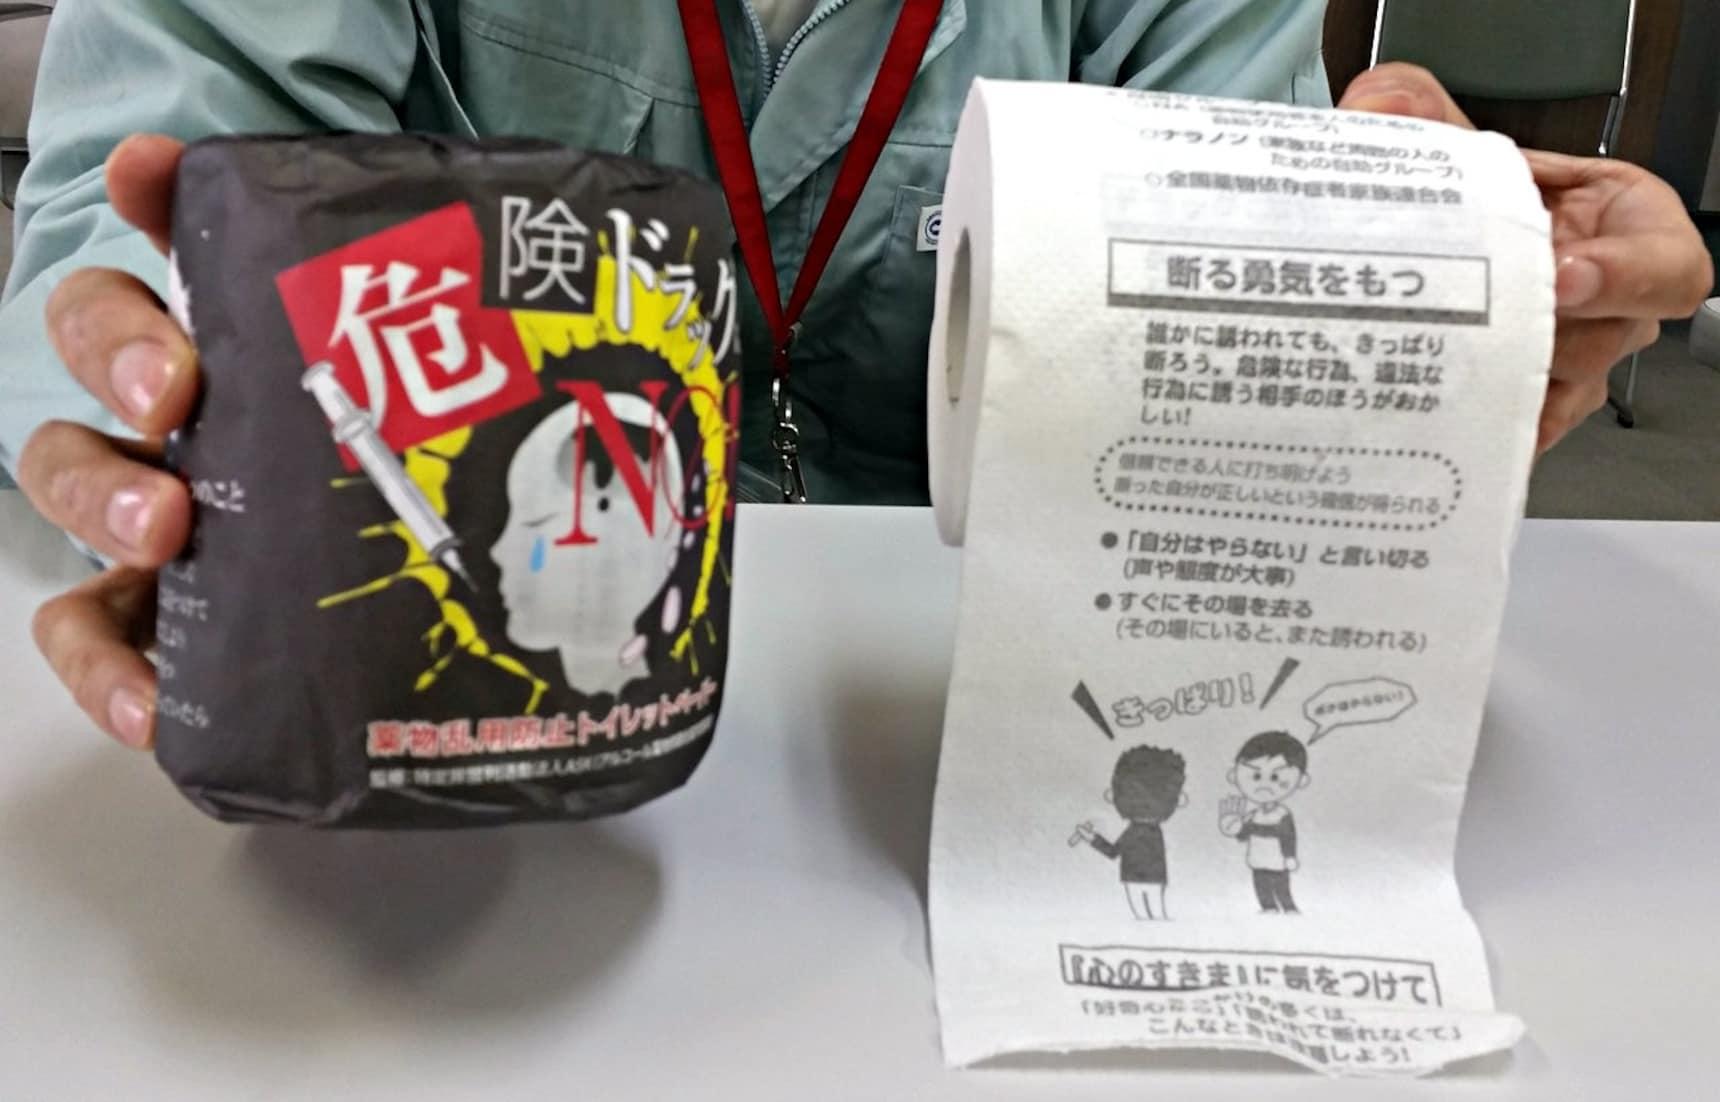 Japan's Great Toilet Paper Messages